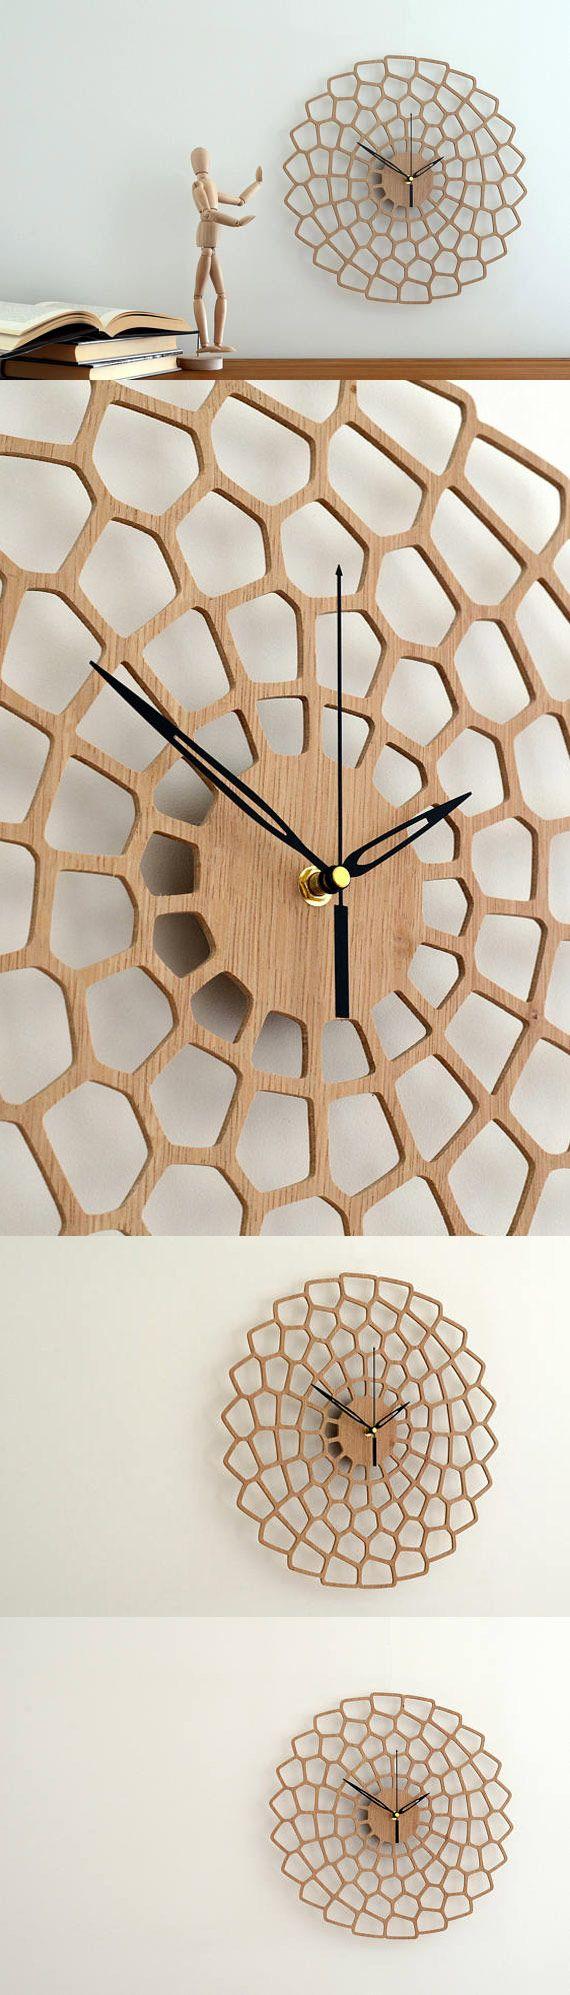 "17"" Wall Clock - Newlywed Gift, Wedding Gift, Large Wall Clock, Home Decor Gift, Wooden Clock, Modern Wall Clocks, Wall Clock Large"